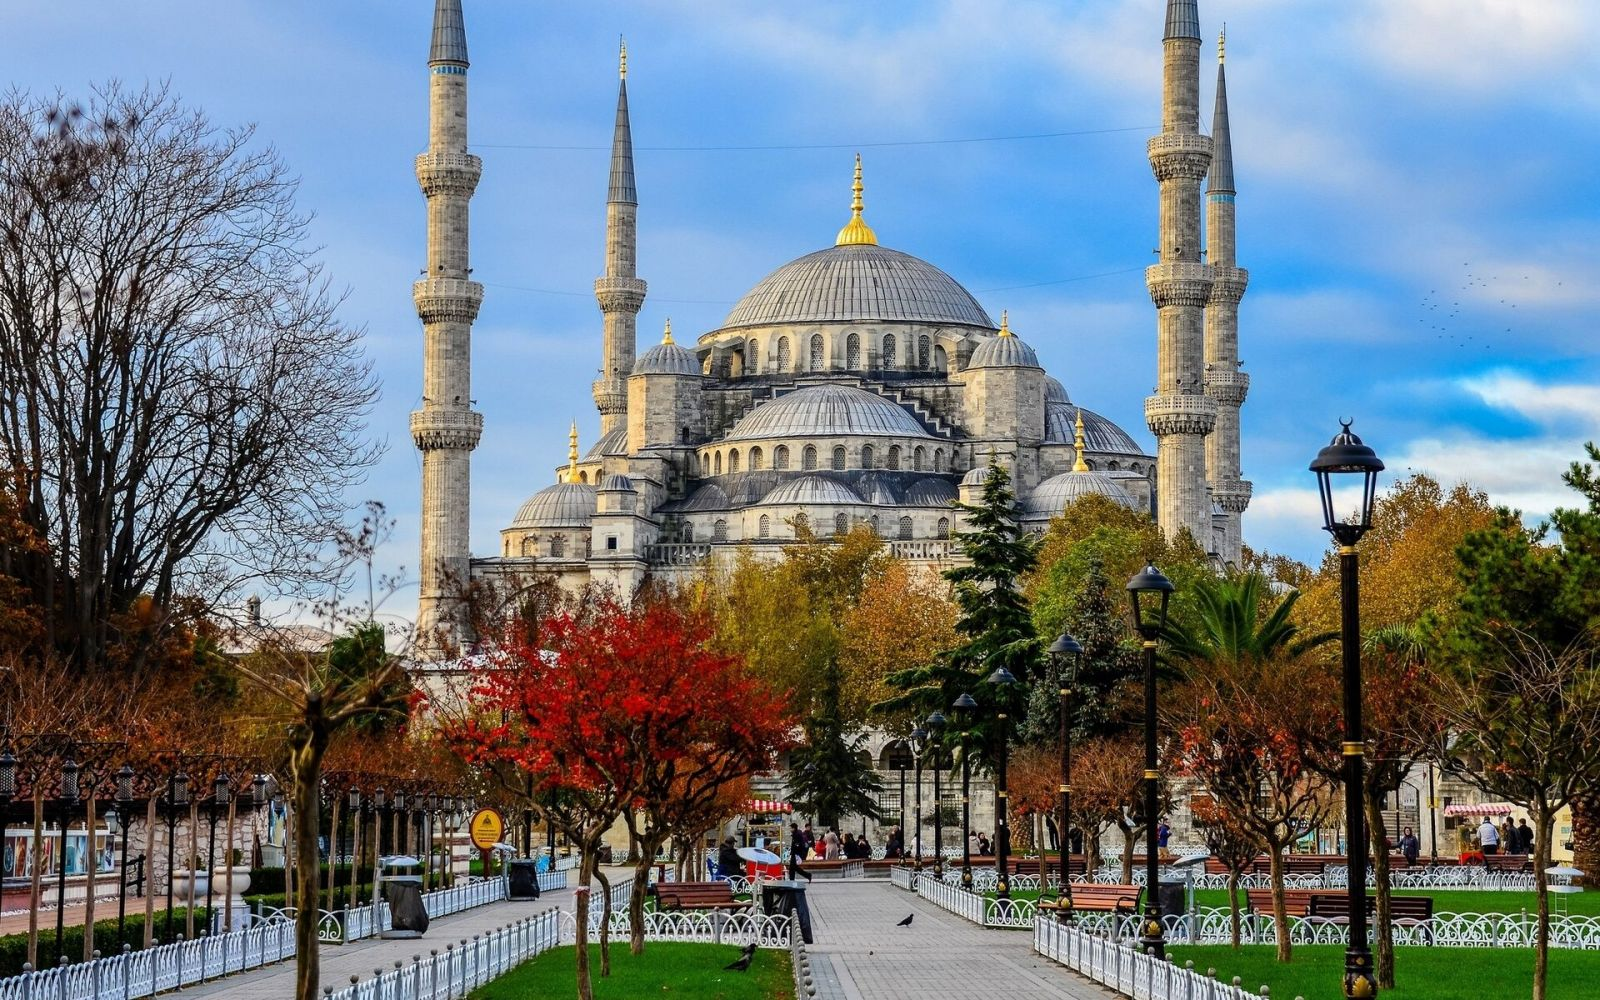 تور استانبول نوروز ۹۷ | تور استانبول